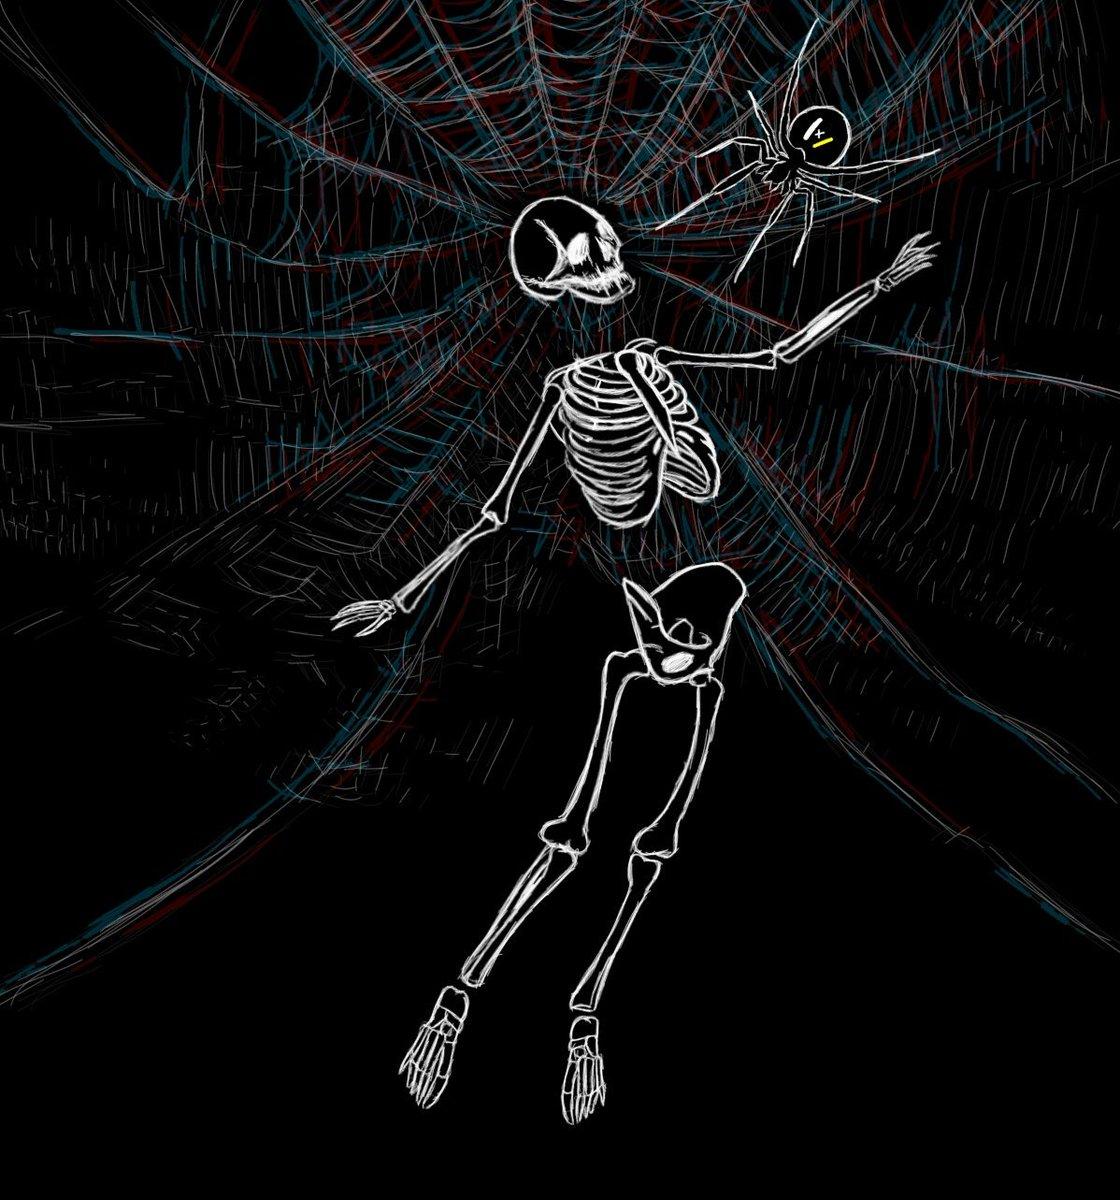 ×ODE TO SLEEP× @joshuadun @tylerrjoseph @twentyonepilots @skeletonclique #cliqueart #fanartfriday Art inspired by the legendary @ksnickss<br>http://pic.twitter.com/kDRQMcQ44G